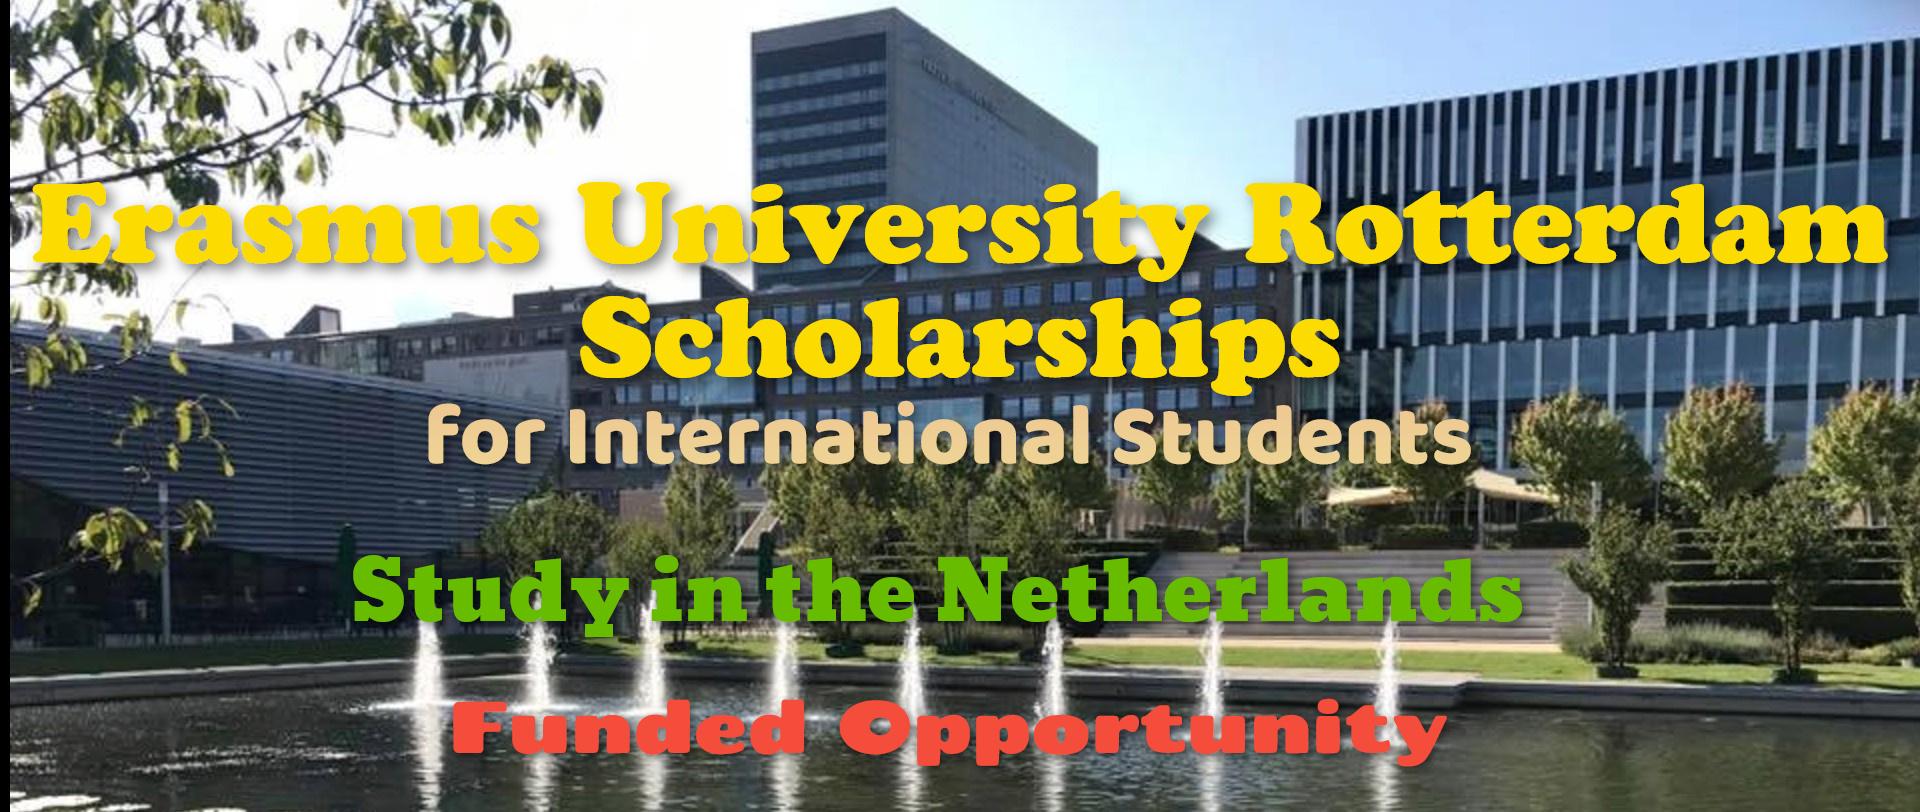 Erasmus University Rotterdam Scholarships